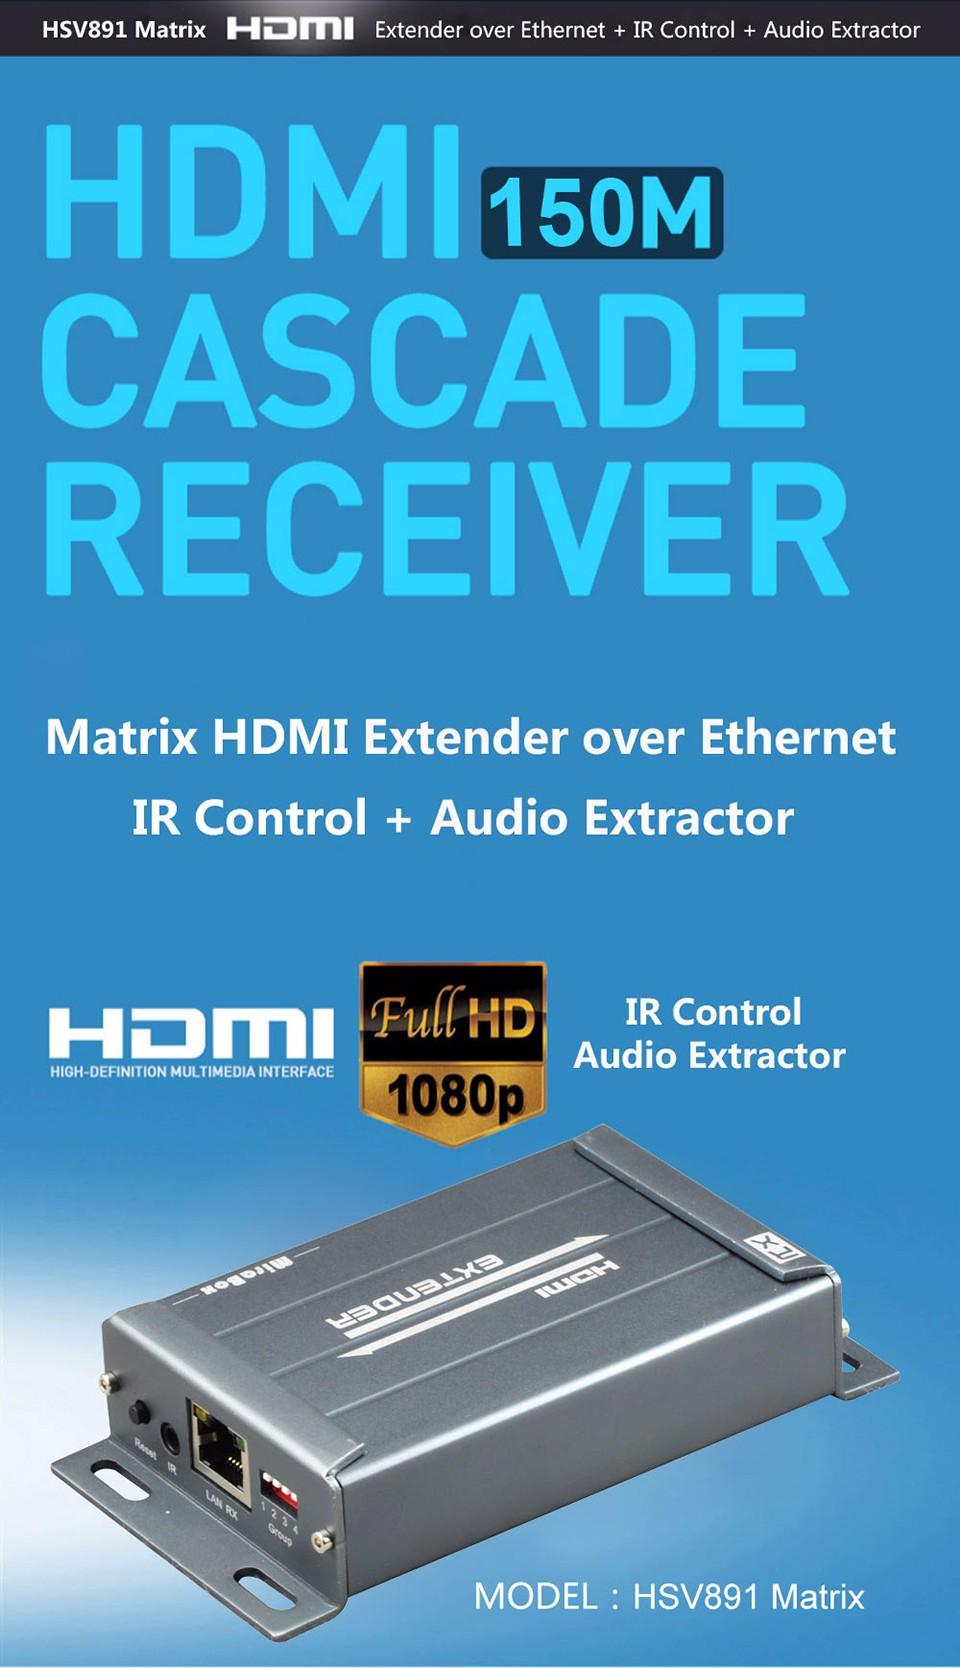 HDMI-EXTENDER-HSV891Matrix_02